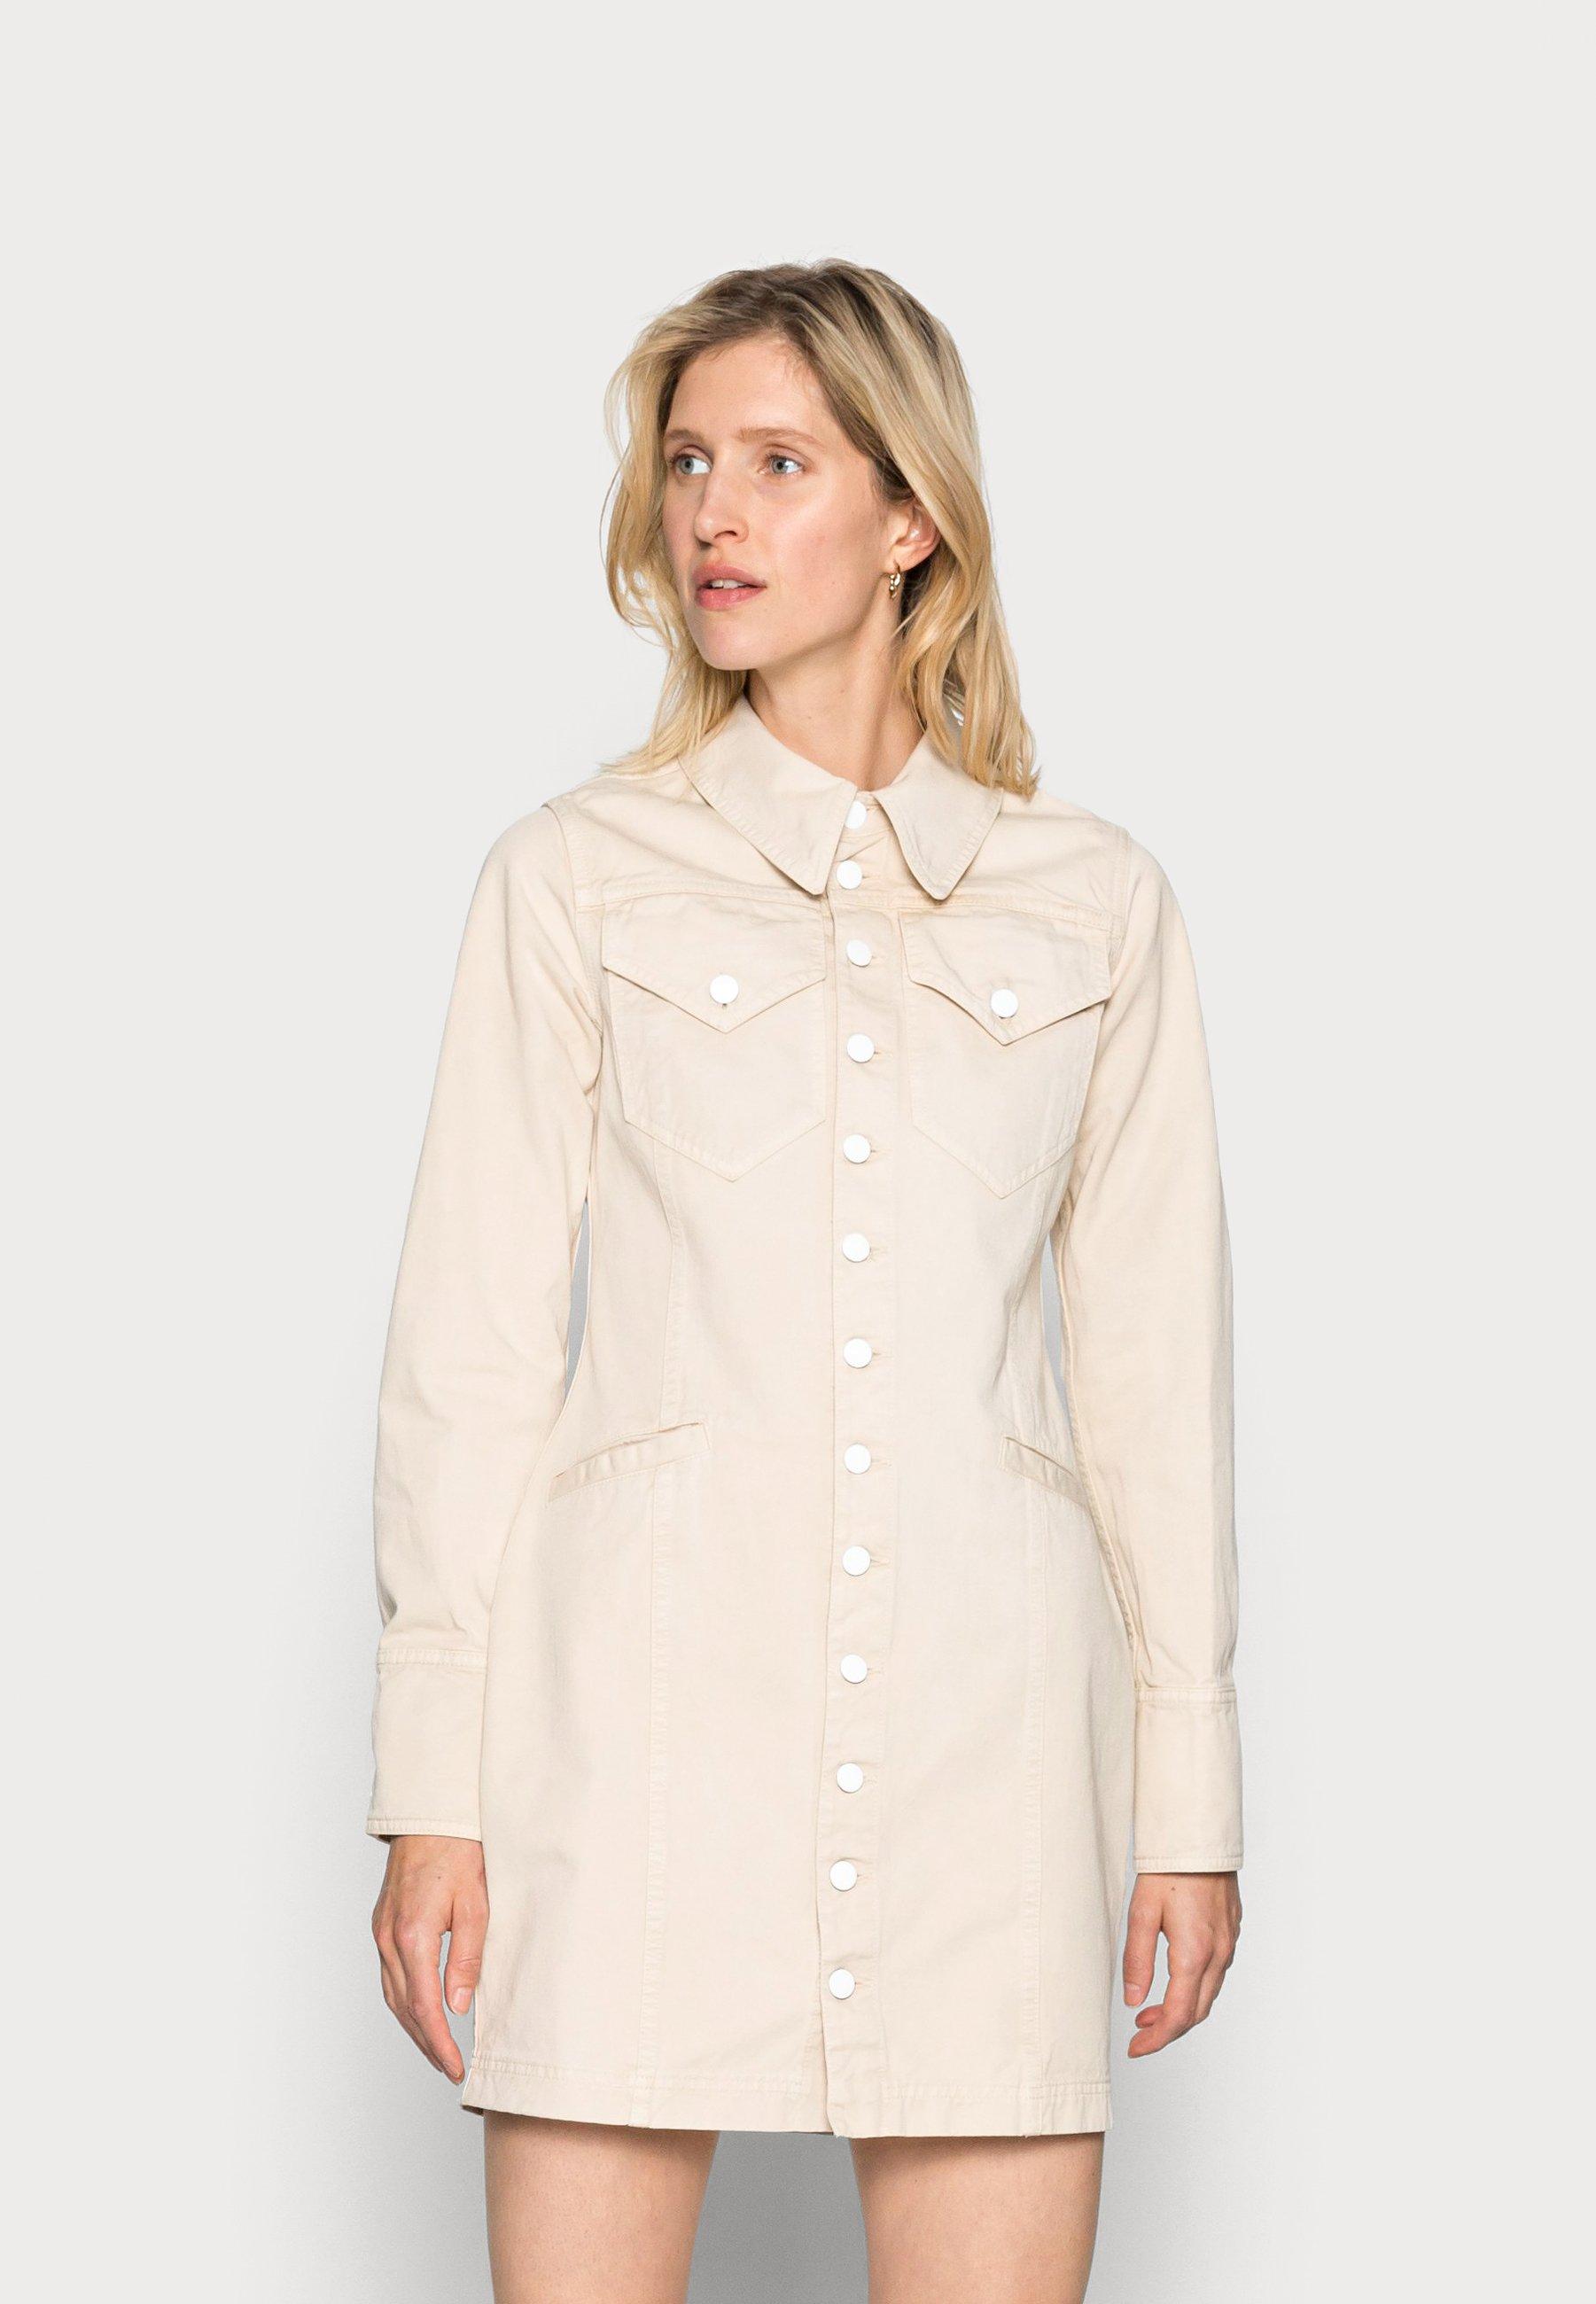 Women VANESSA HONG x BIRGITTE HERSKIND ARIEL DRESS - Denim dress